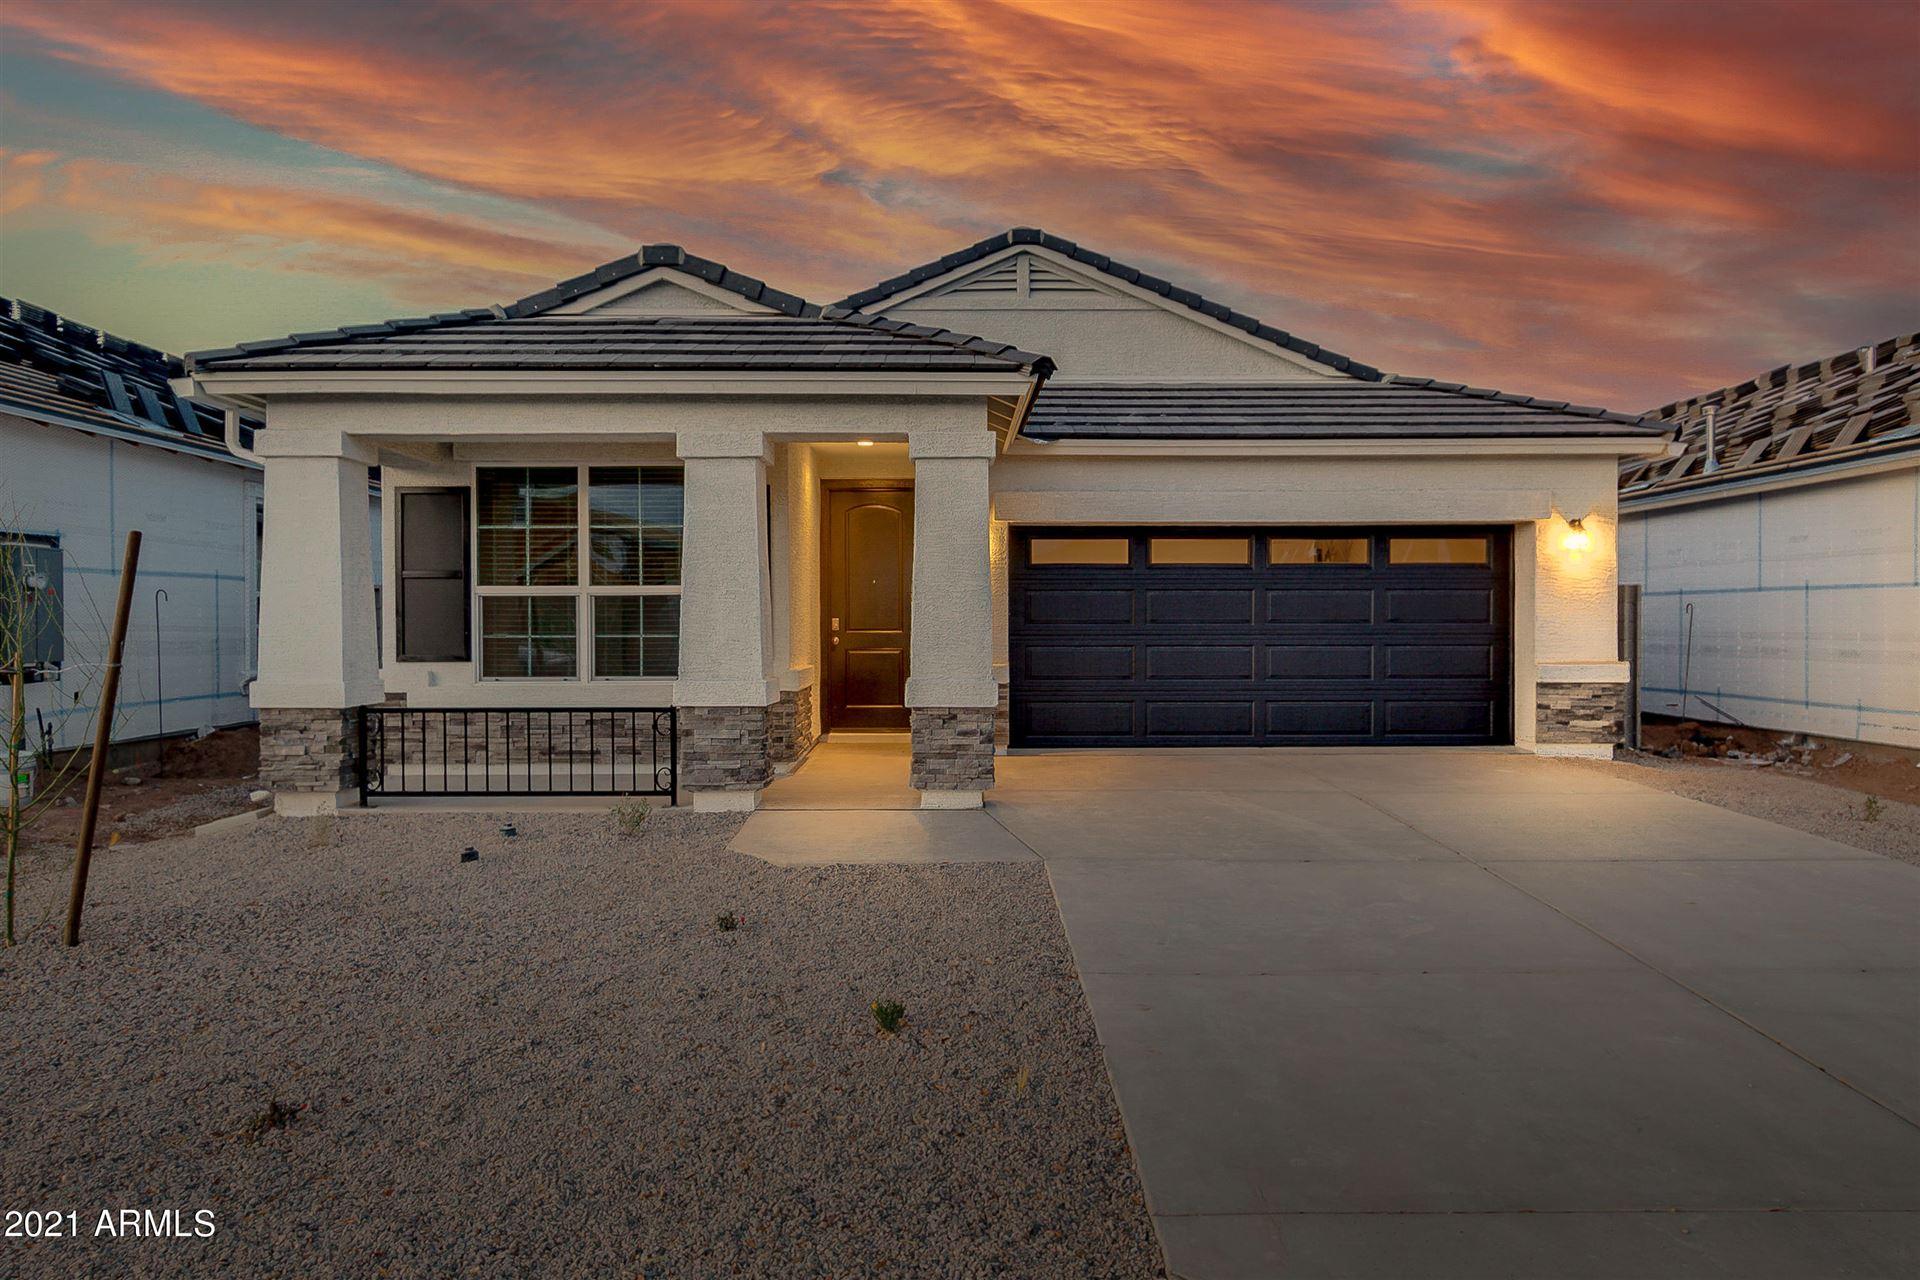 Photo of 38172 W SAN SISTO Avenue, Maricopa, AZ 85138 (MLS # 6202293)